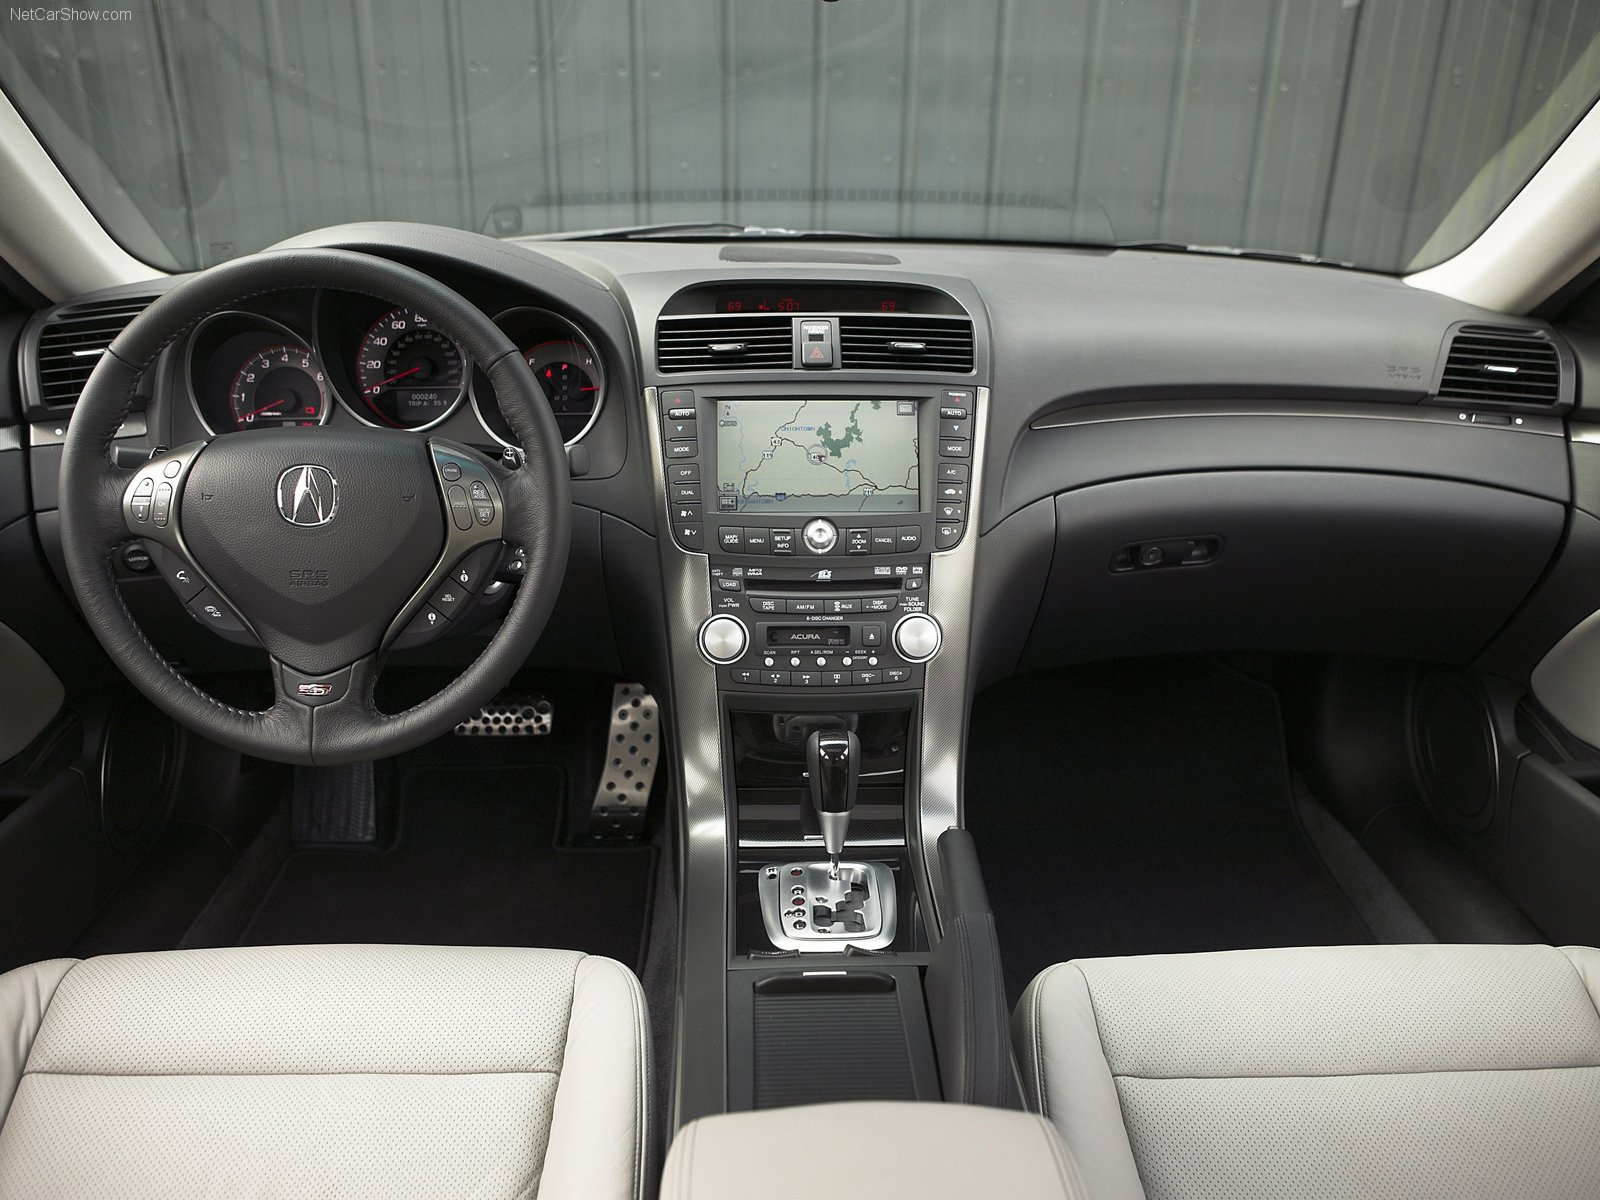 Acura t l type s interior 2004 wallpaper 1600x1200 404092 wallpaperup